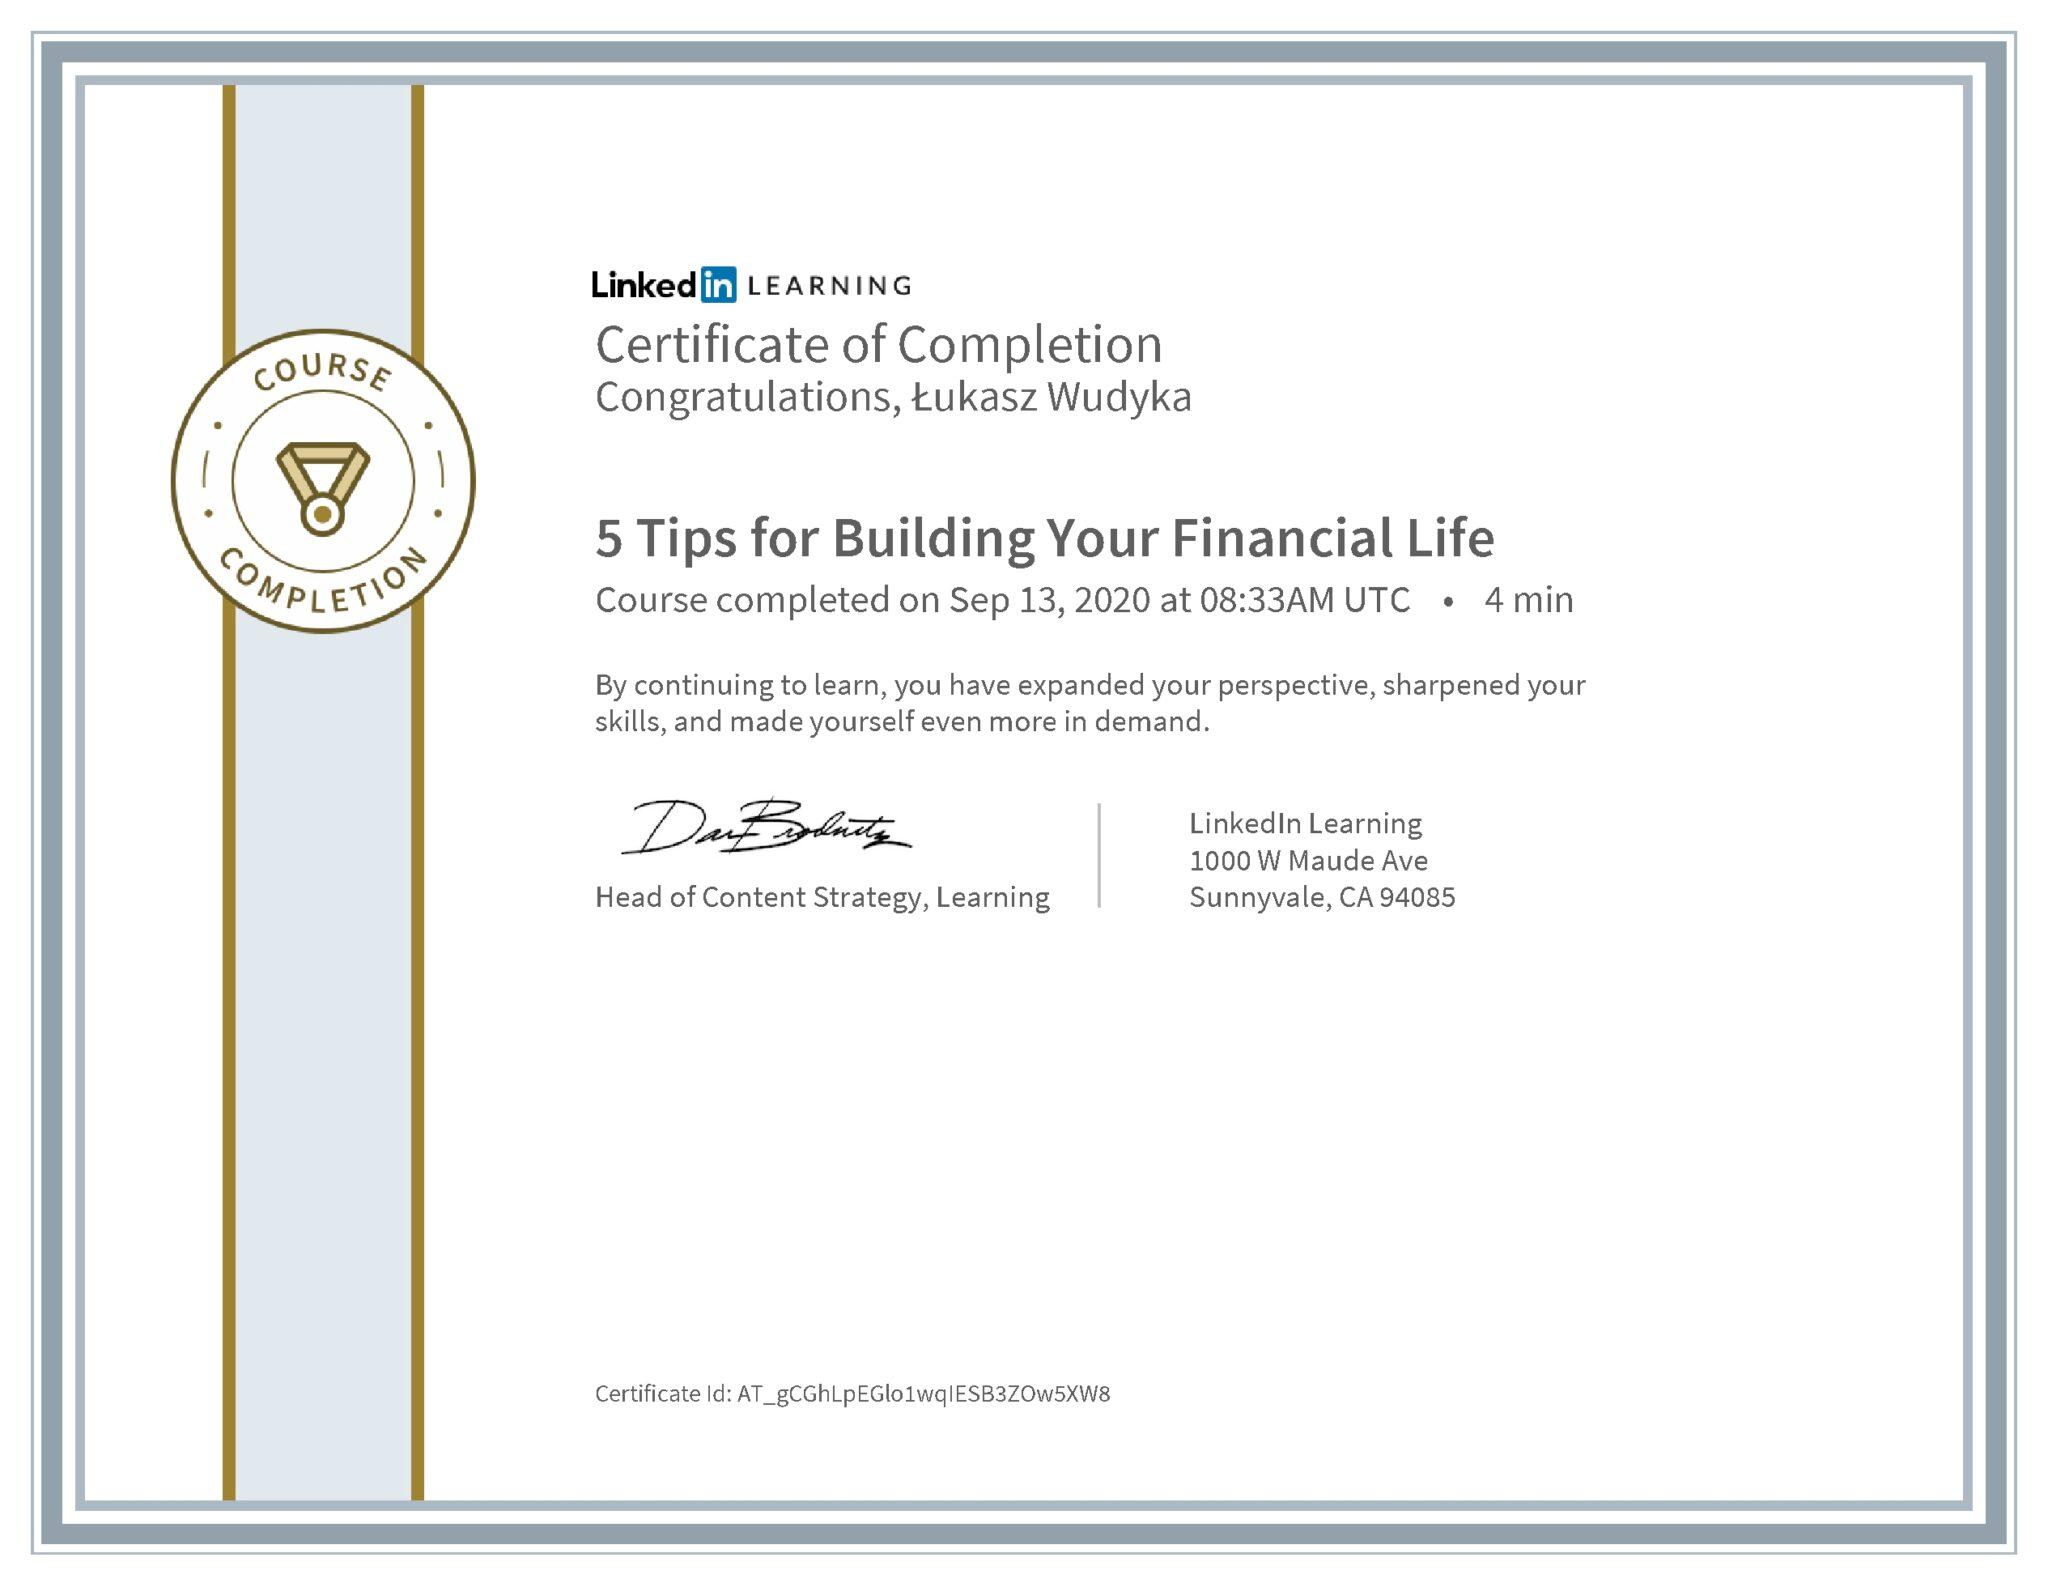 Łukasz Wudyka certyfikat LinkedIn 5 Tips for Building Your Financial Life